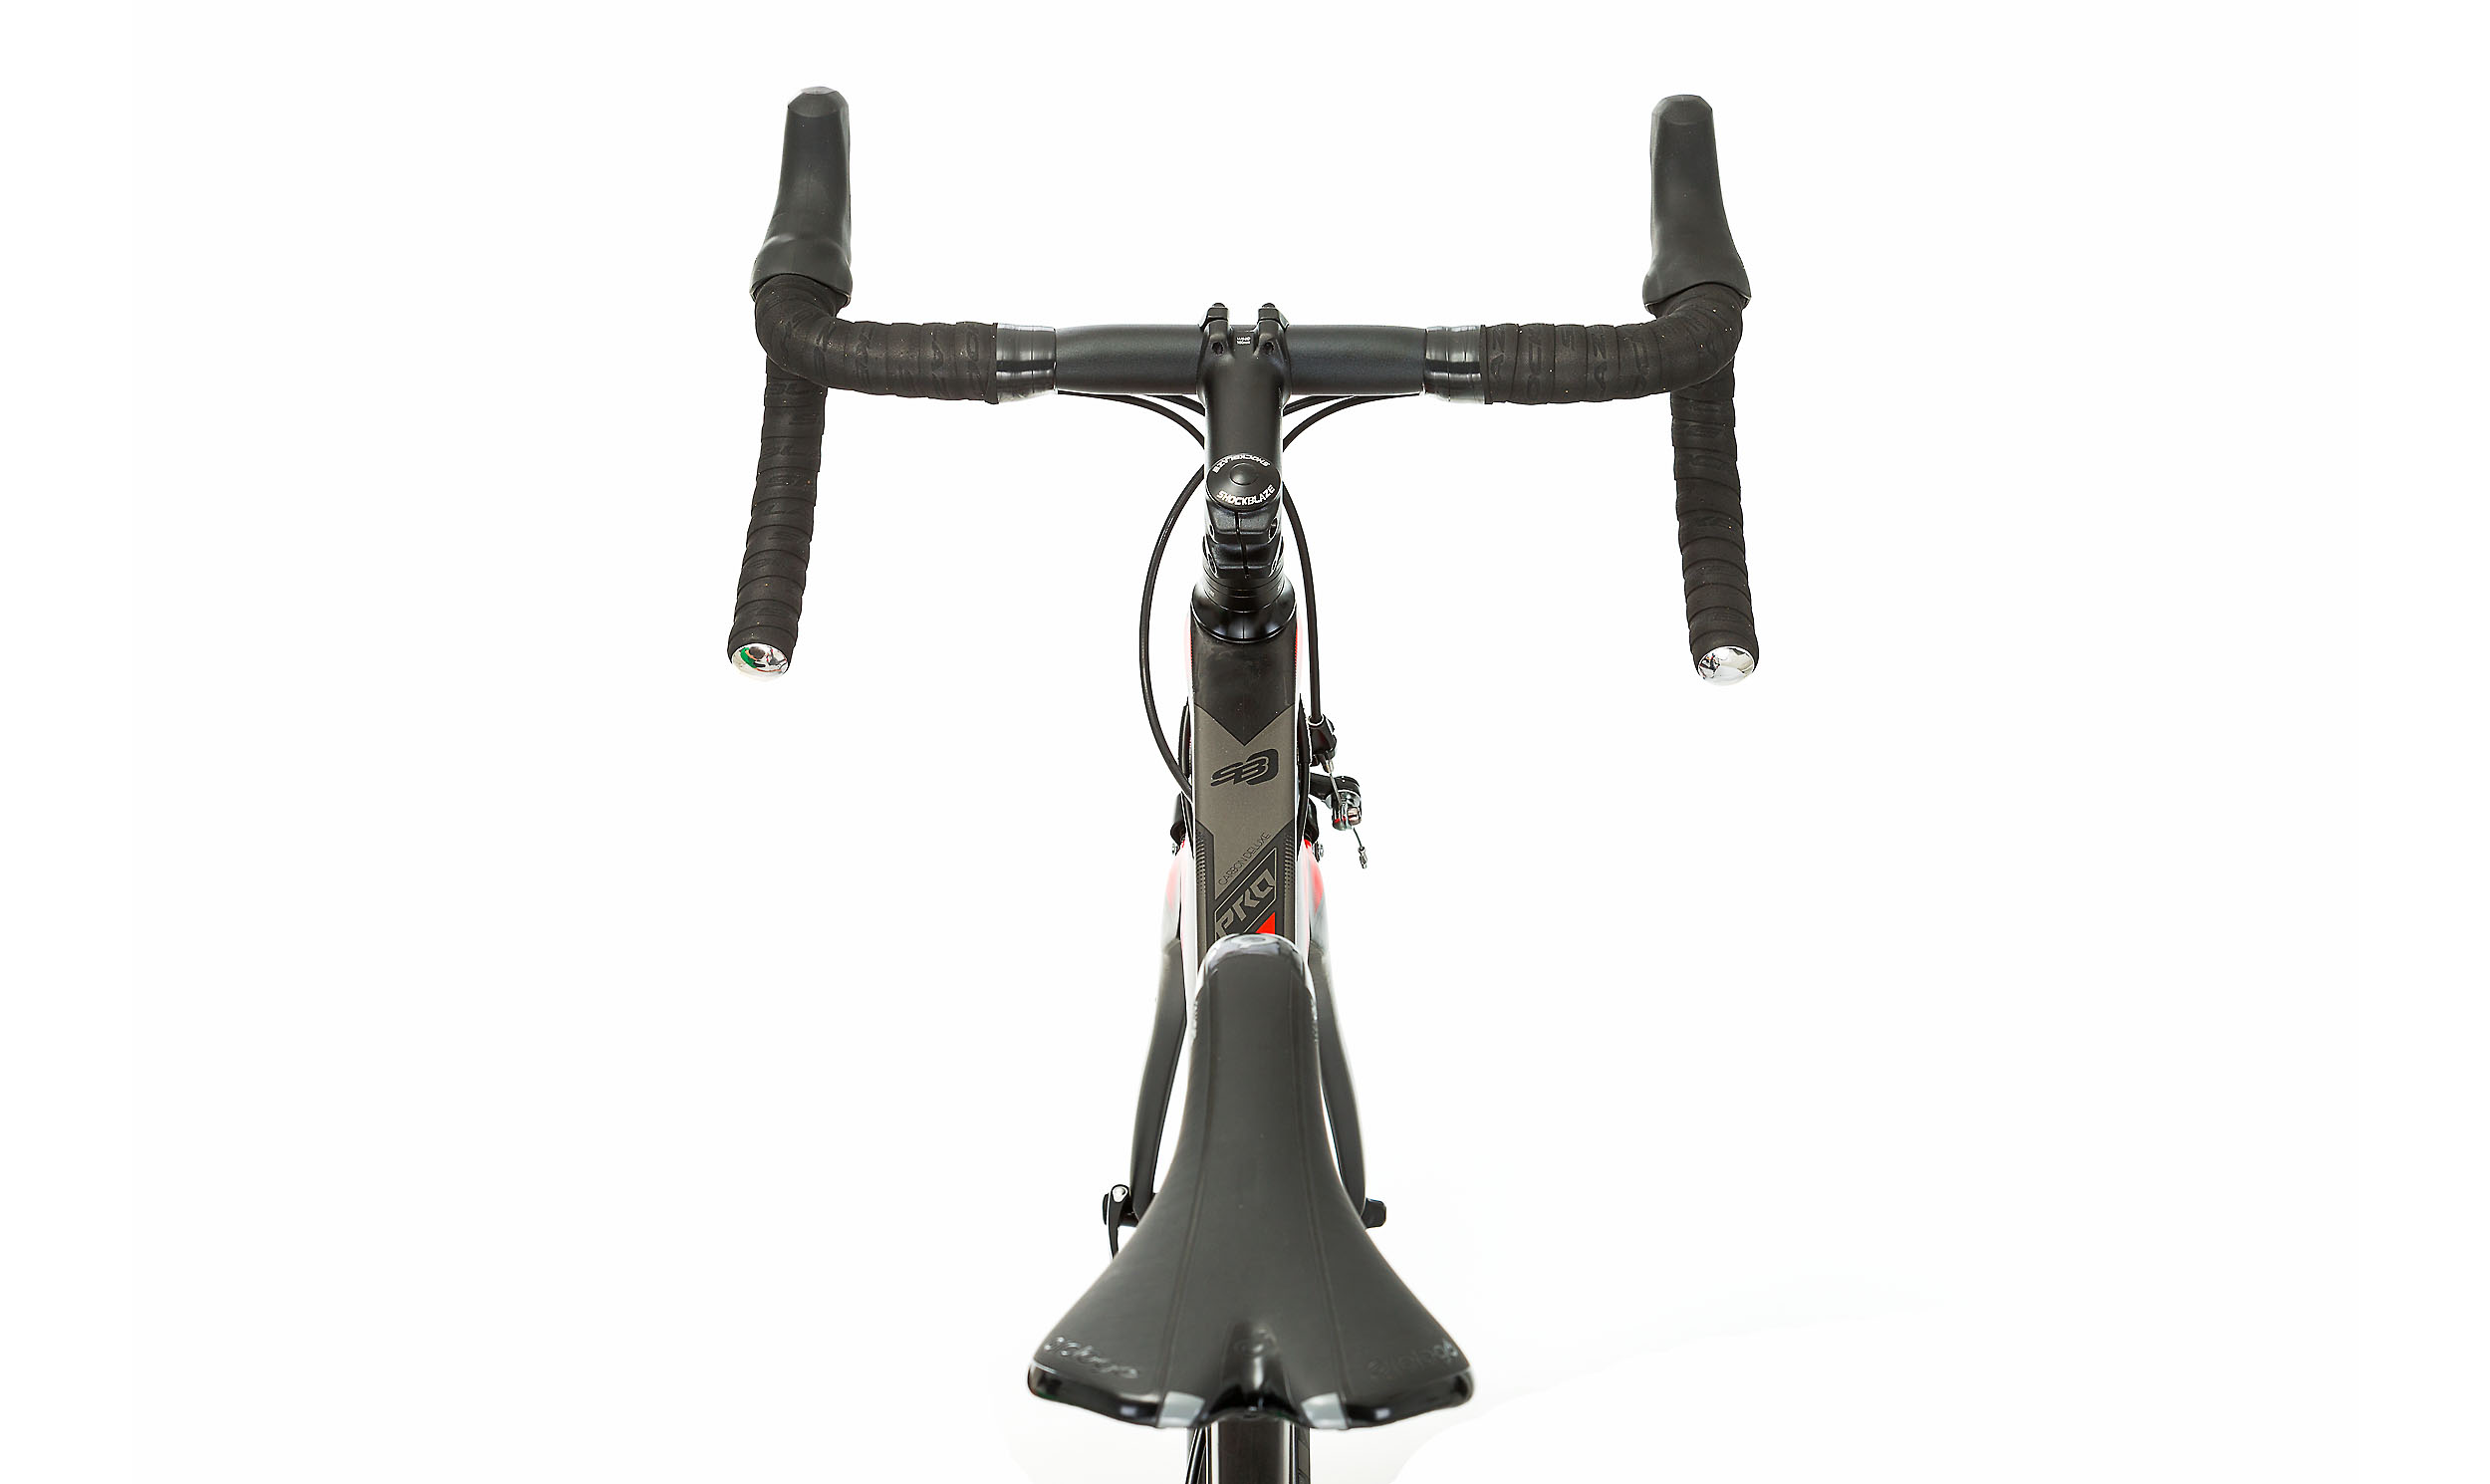 S5 Pro Tiagra Bicycles Man Fd Shimano Triagra 4700 Braze On